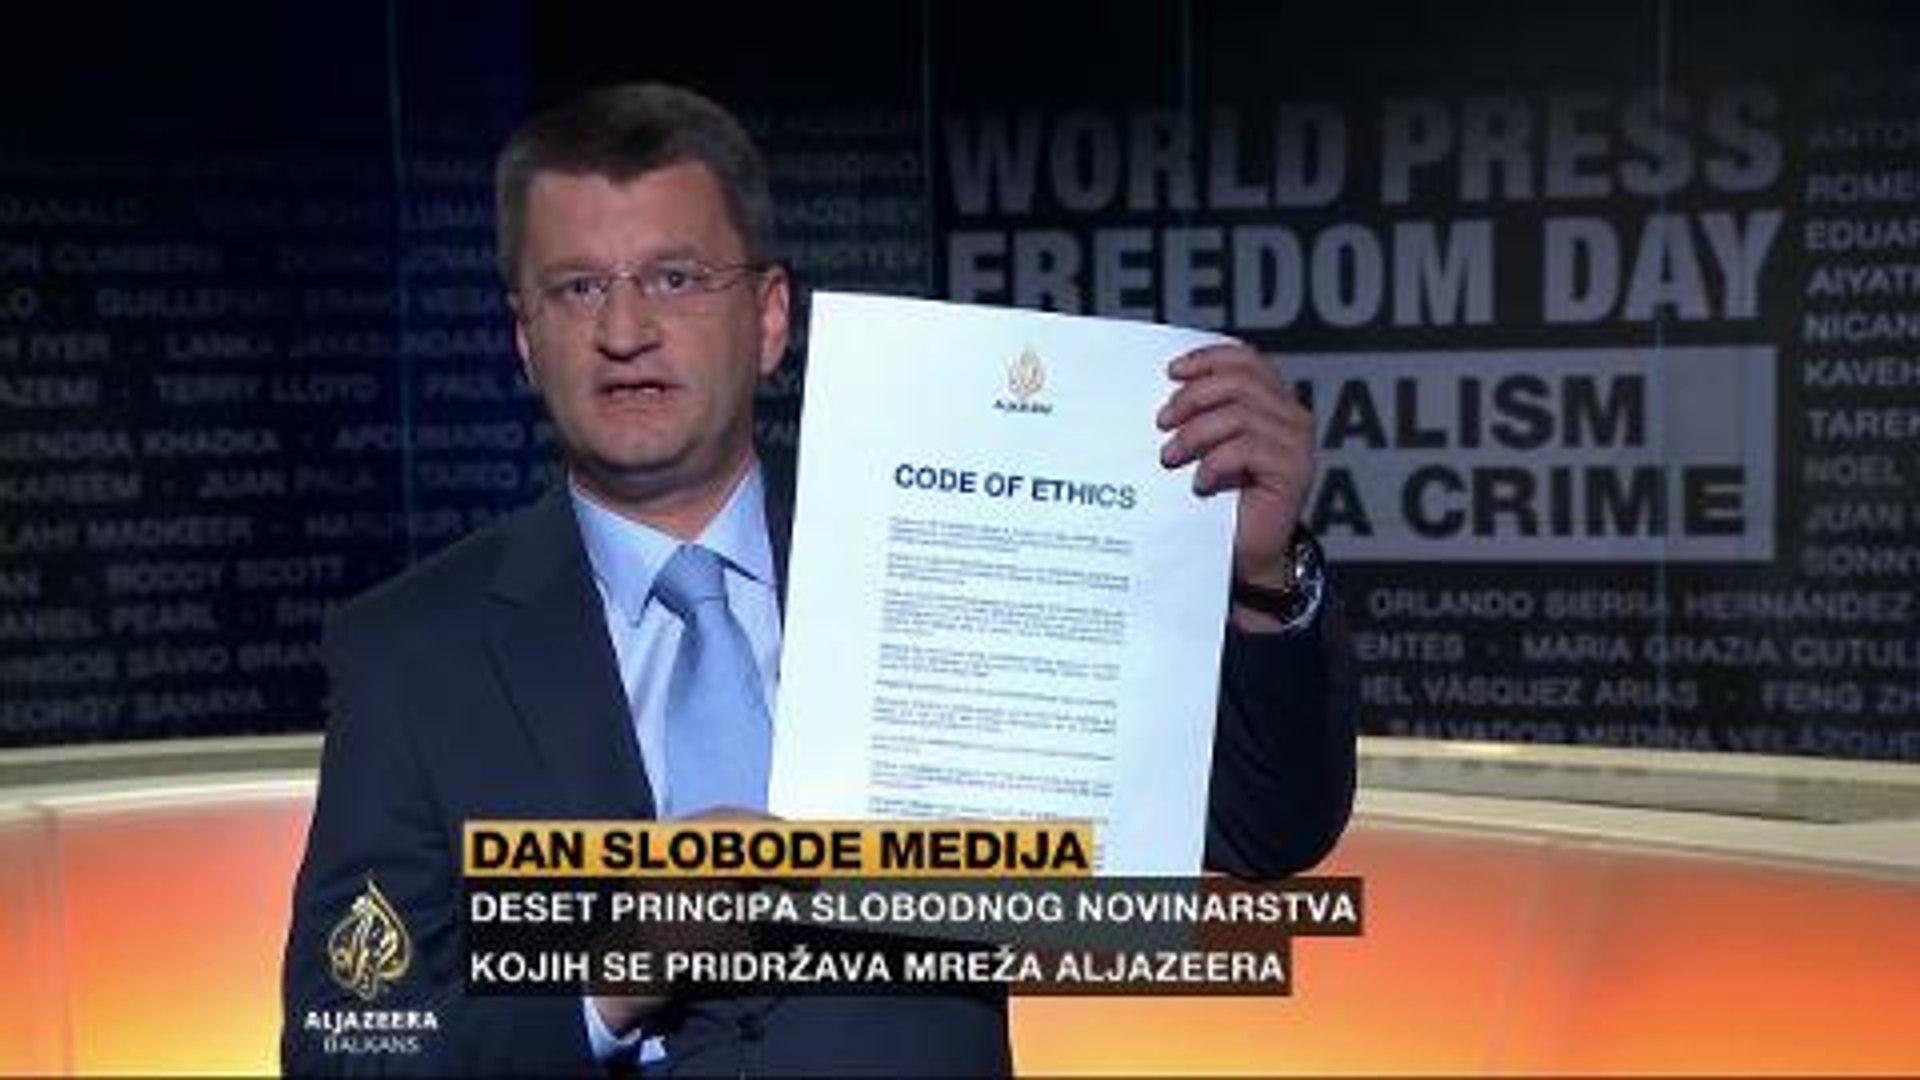 Al Jazeera Balkans obilježila Dan slobode medija